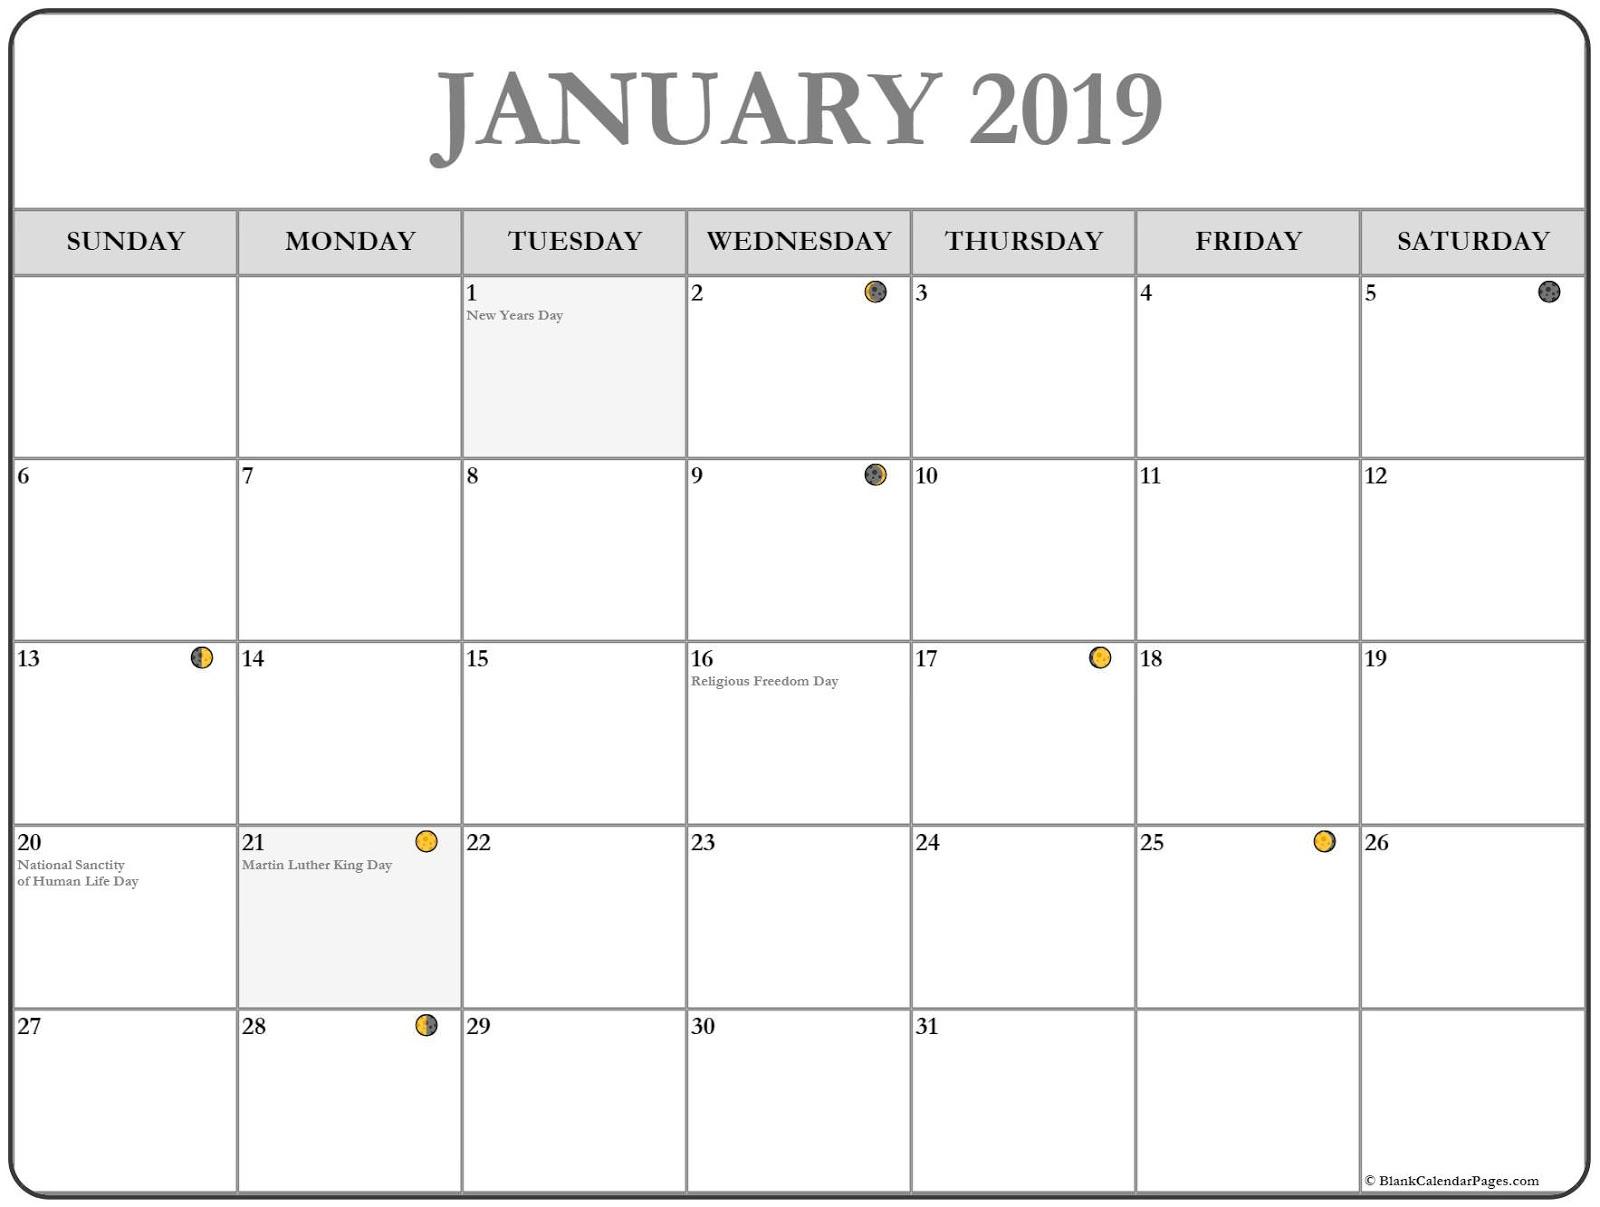 January 2019 Free Editable Calendar